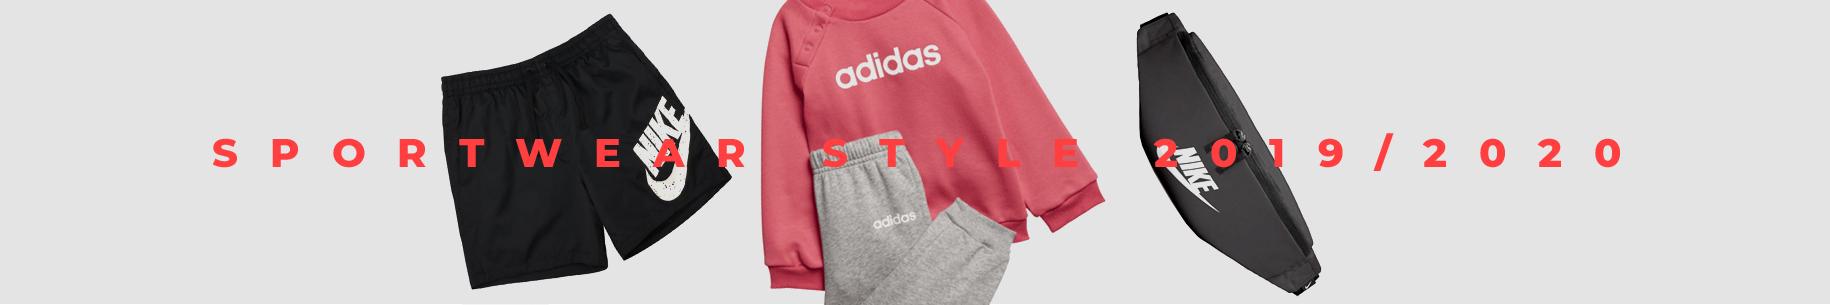 comprar ropa de deporte online